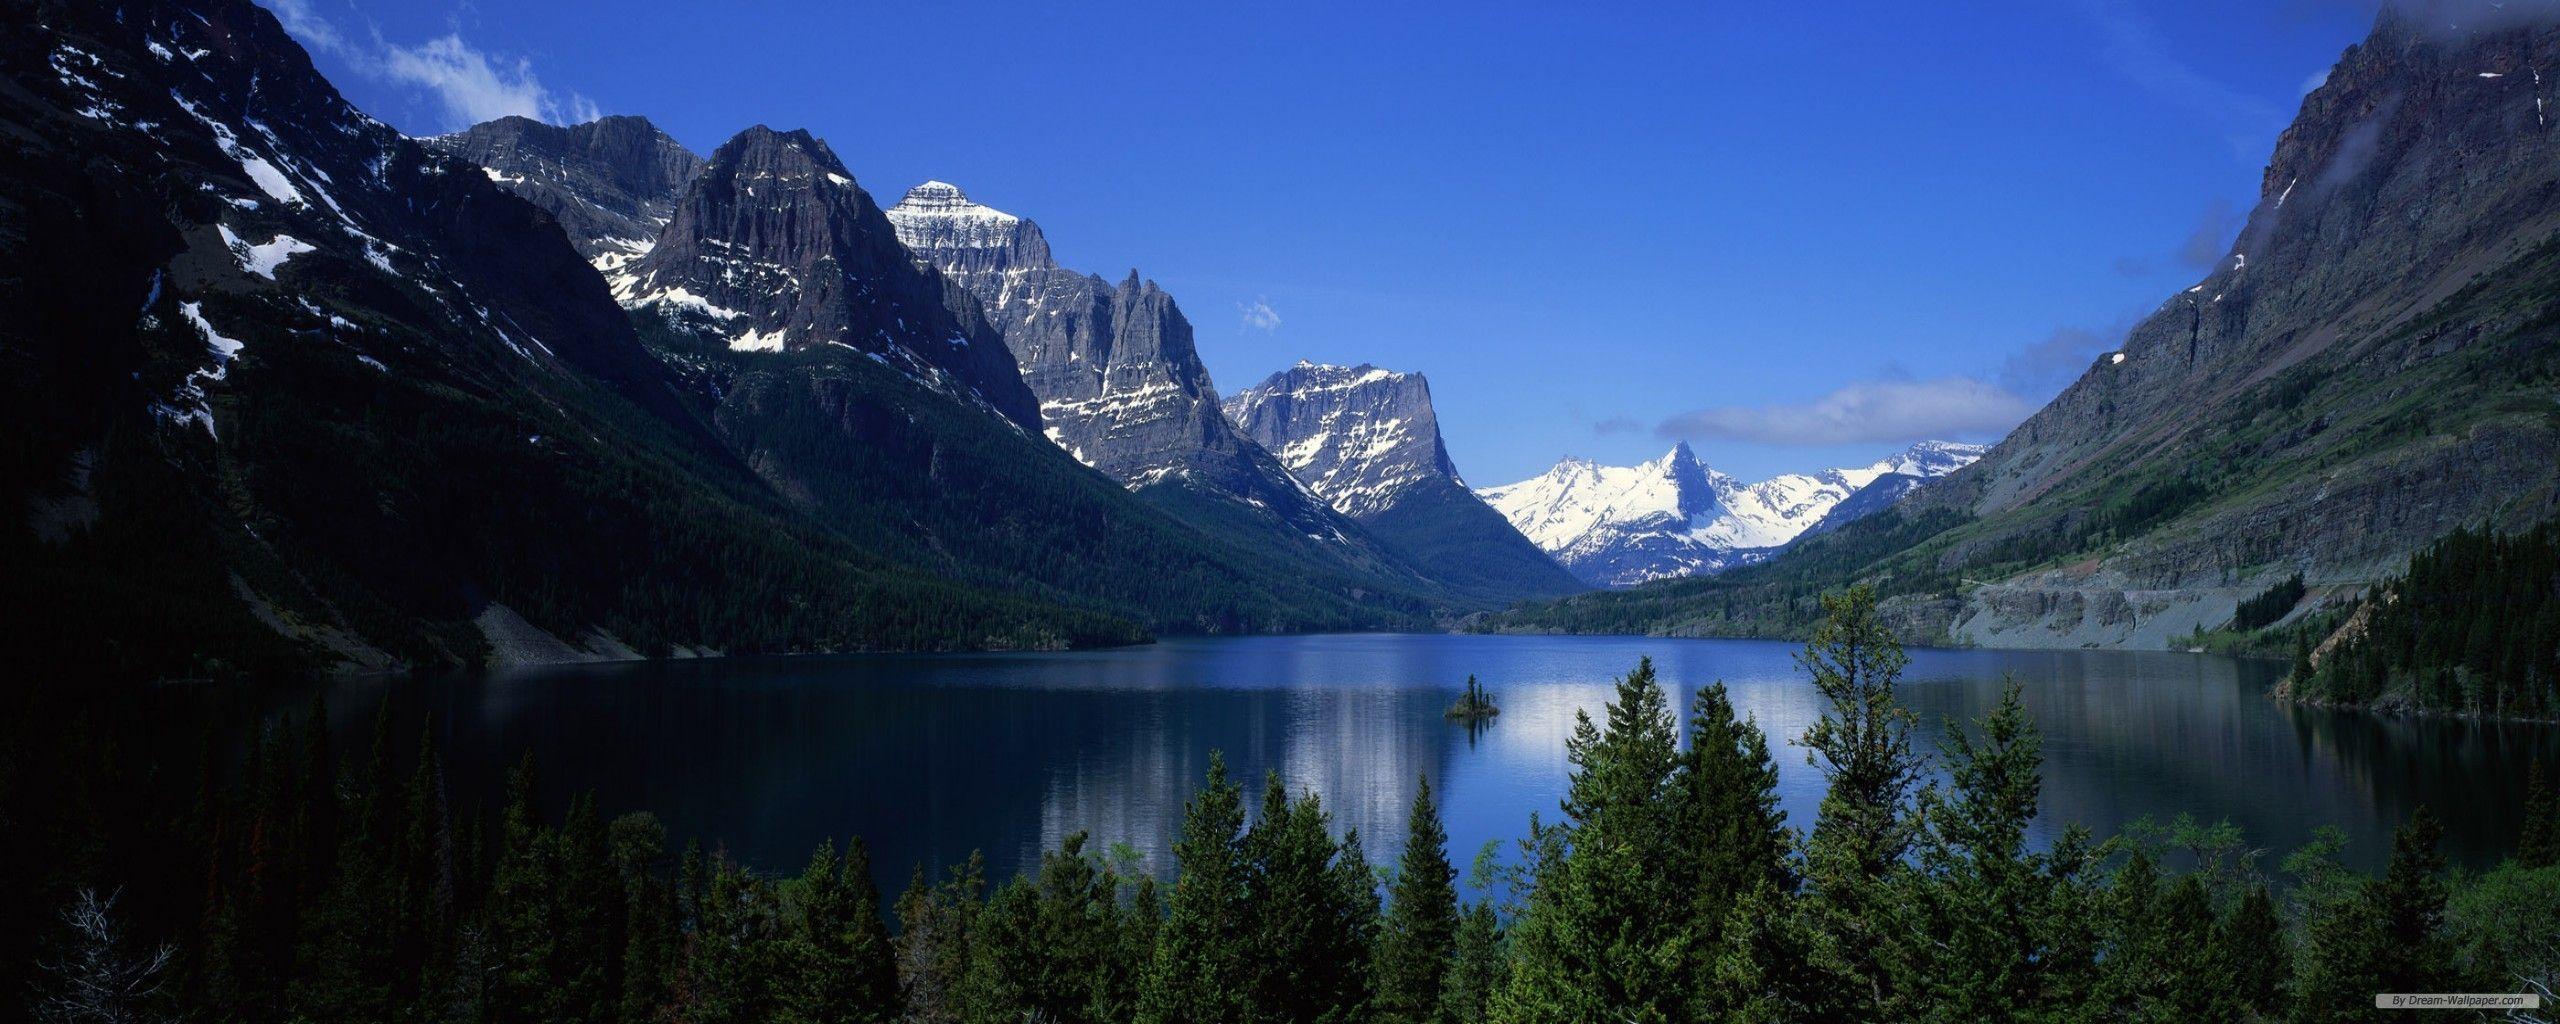 Nature Dual Monitor Wallpapers - Top Free Nature Dual ...